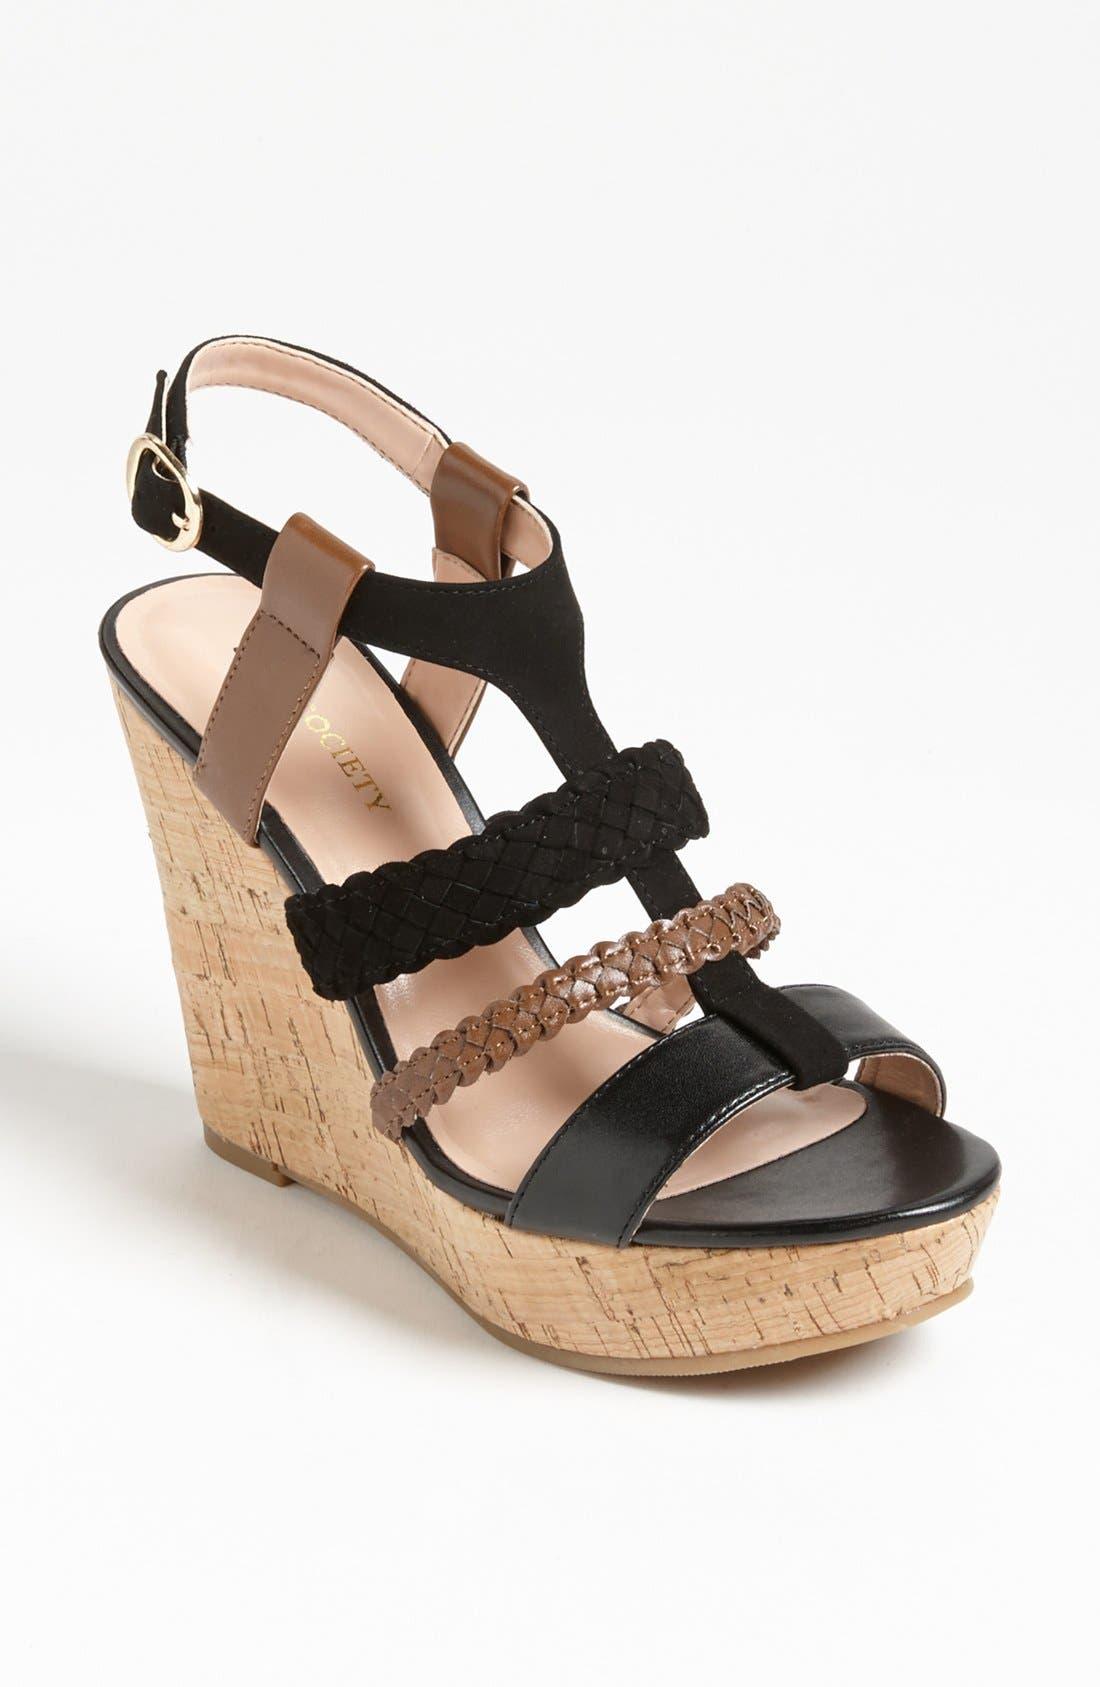 Main Image - Sole Society 'Serina' Wedge Sandal